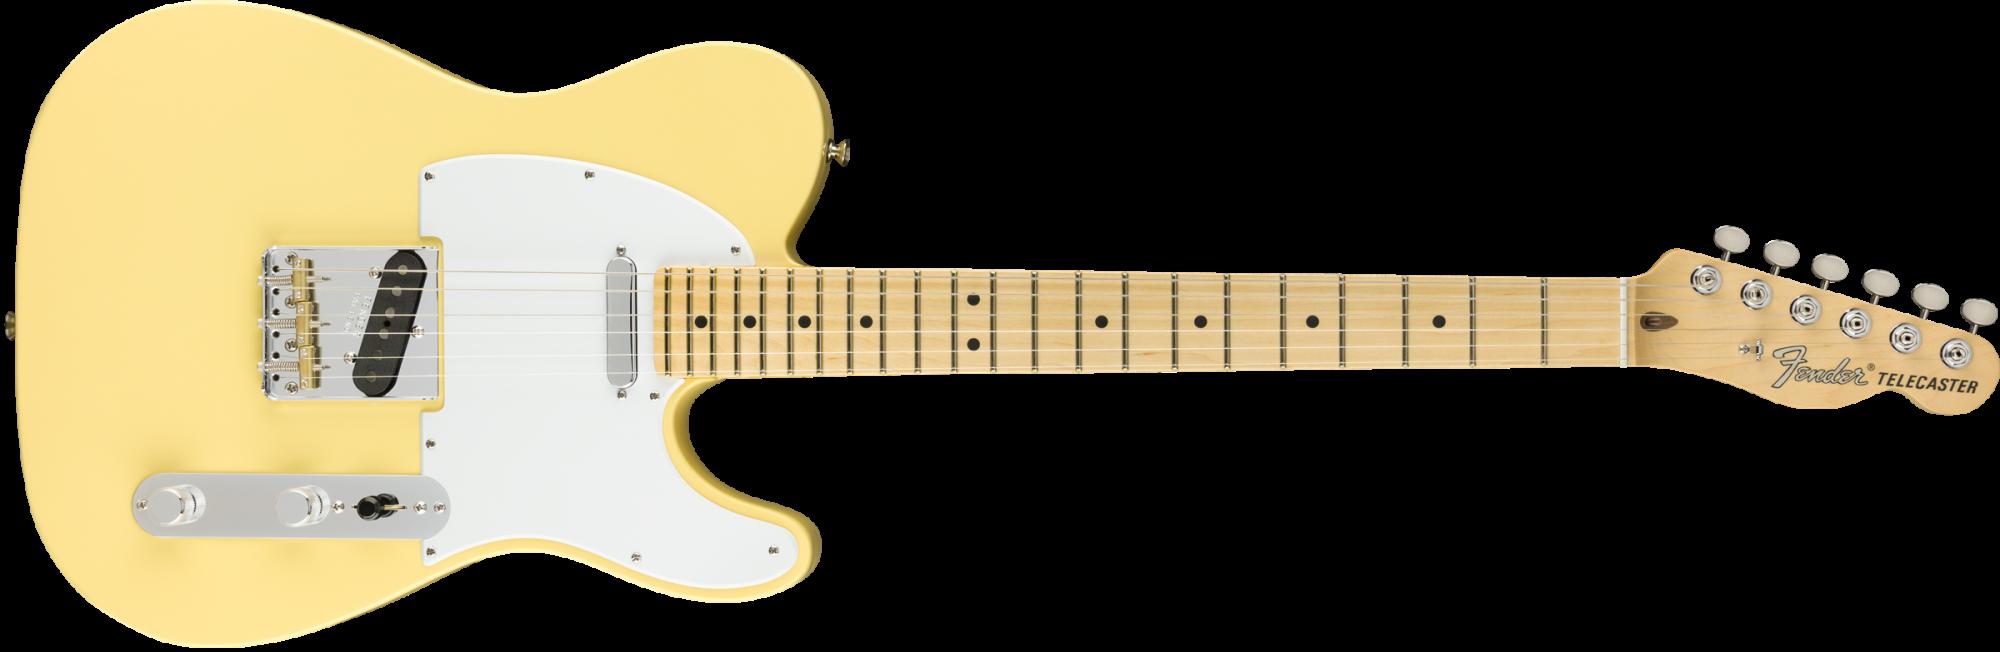 Fender American Performer Telecaster - Maple Fingerboard - Vintage White